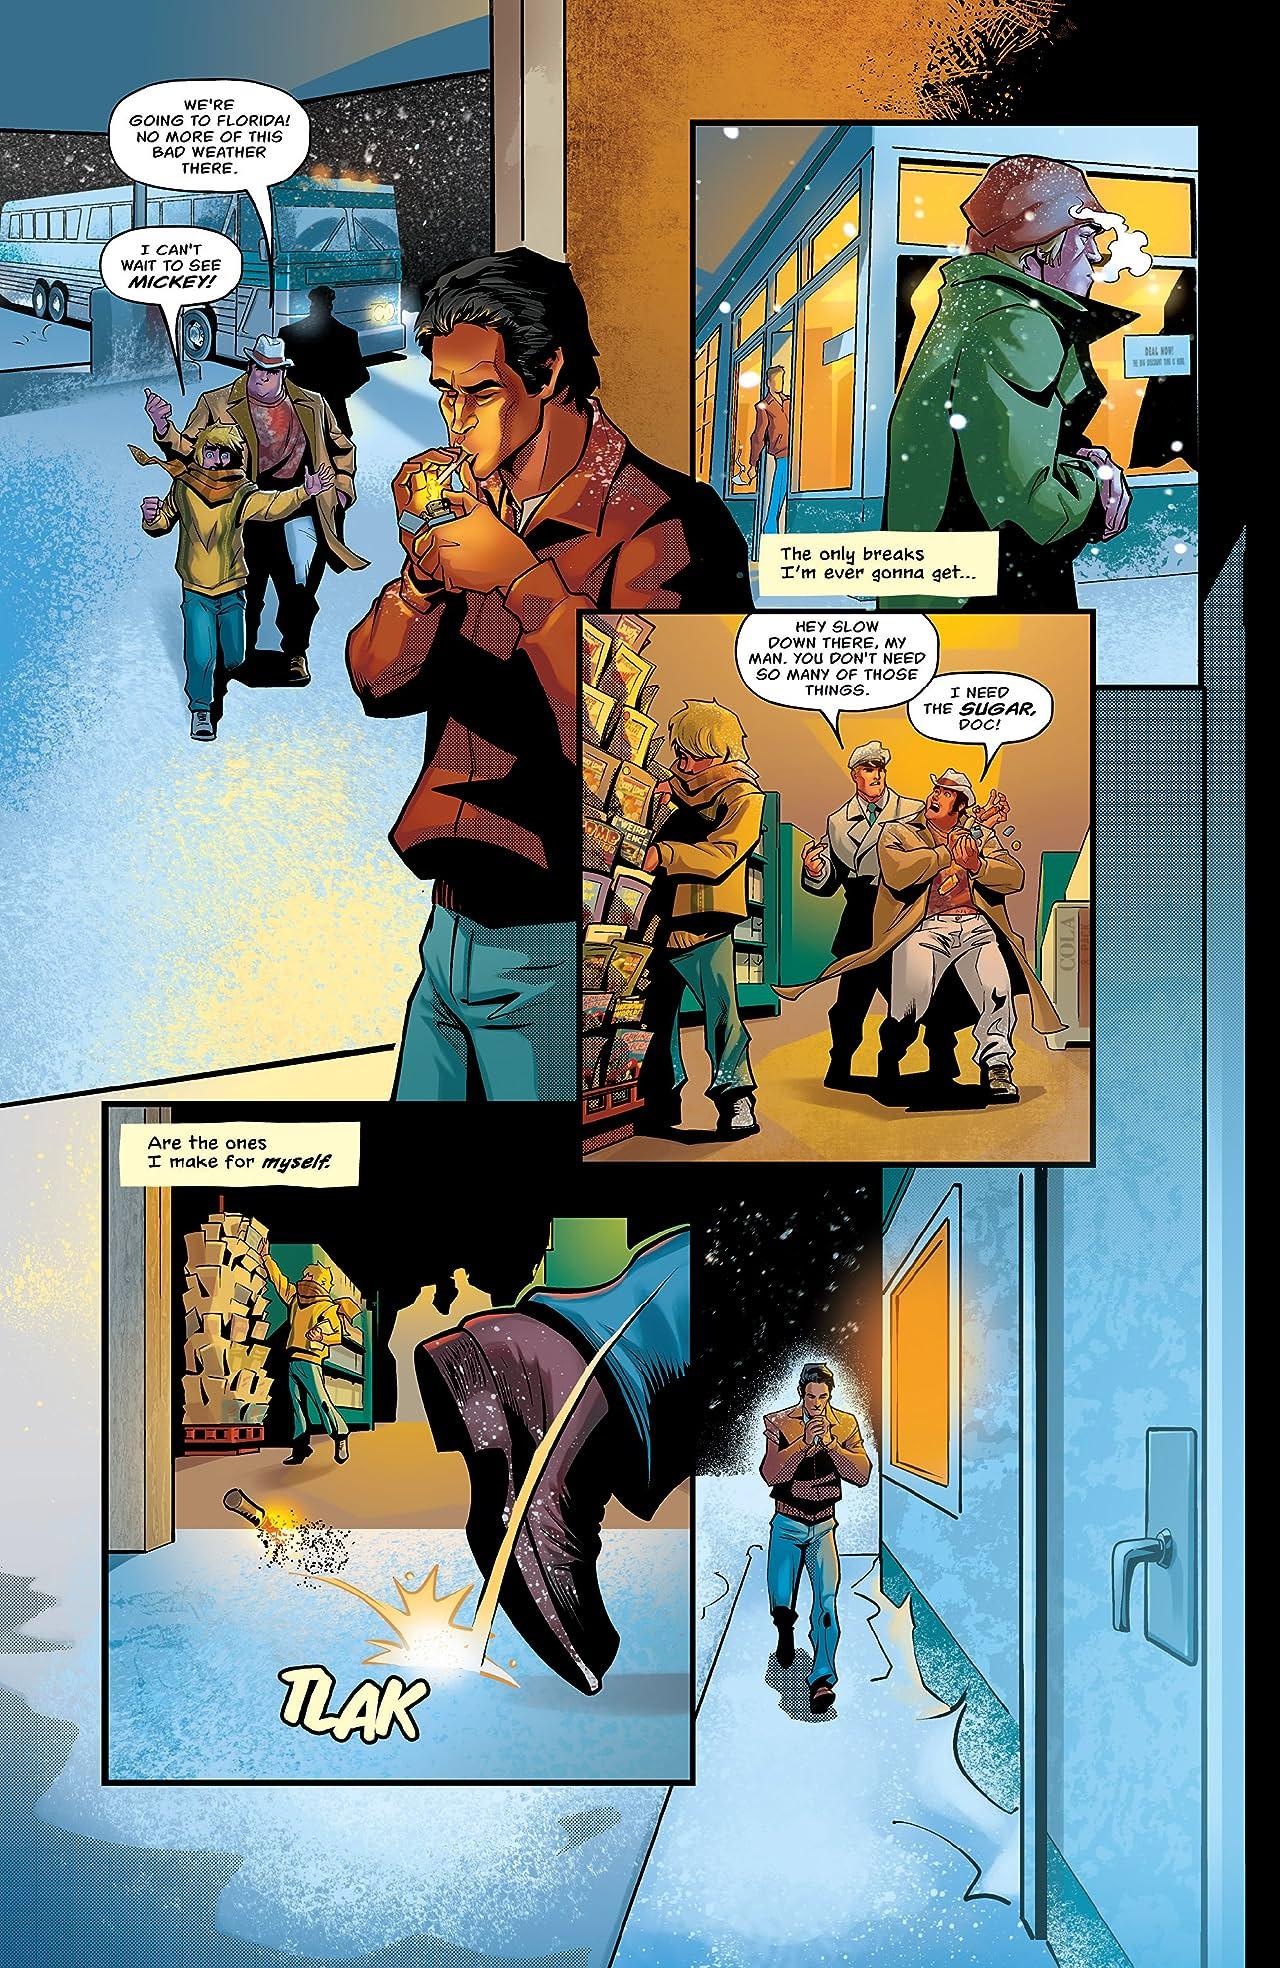 Grimm Tales of Terror Vol. 3 #9